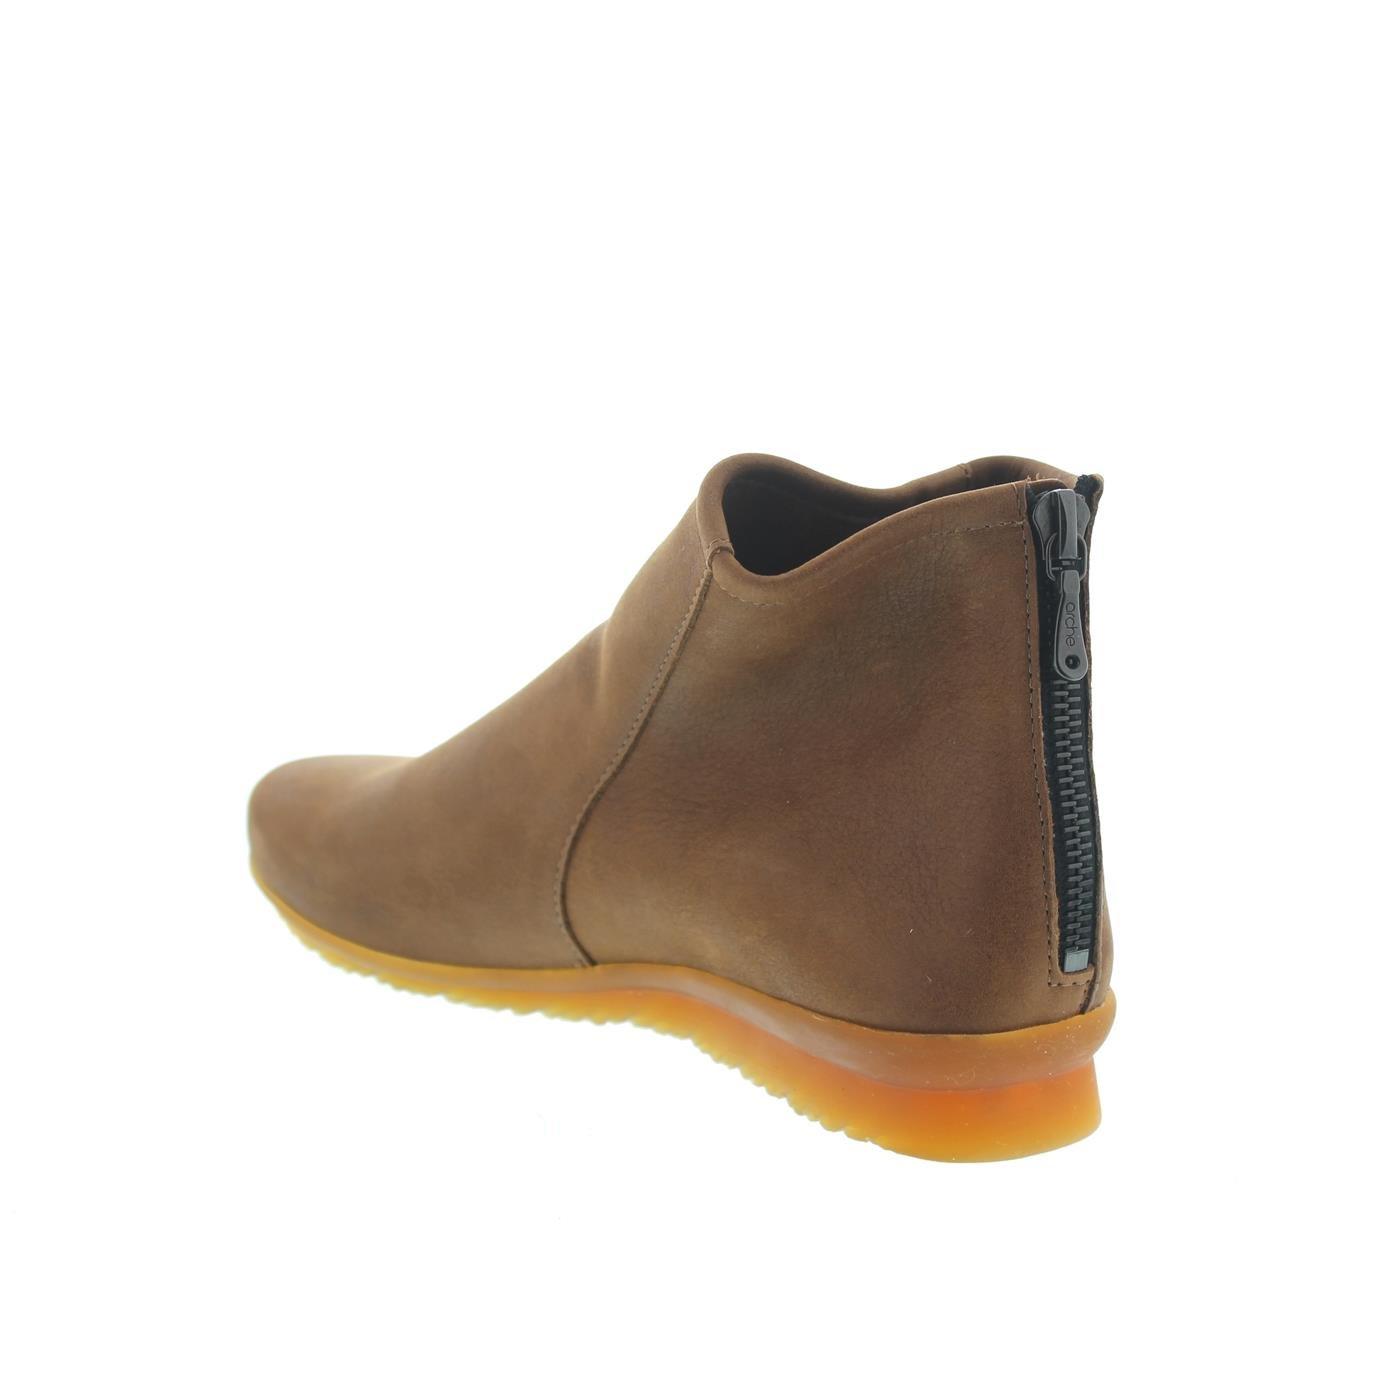 Arche Women's Baryky Boot B01EA5R2S8 7 B(M) US|Havane